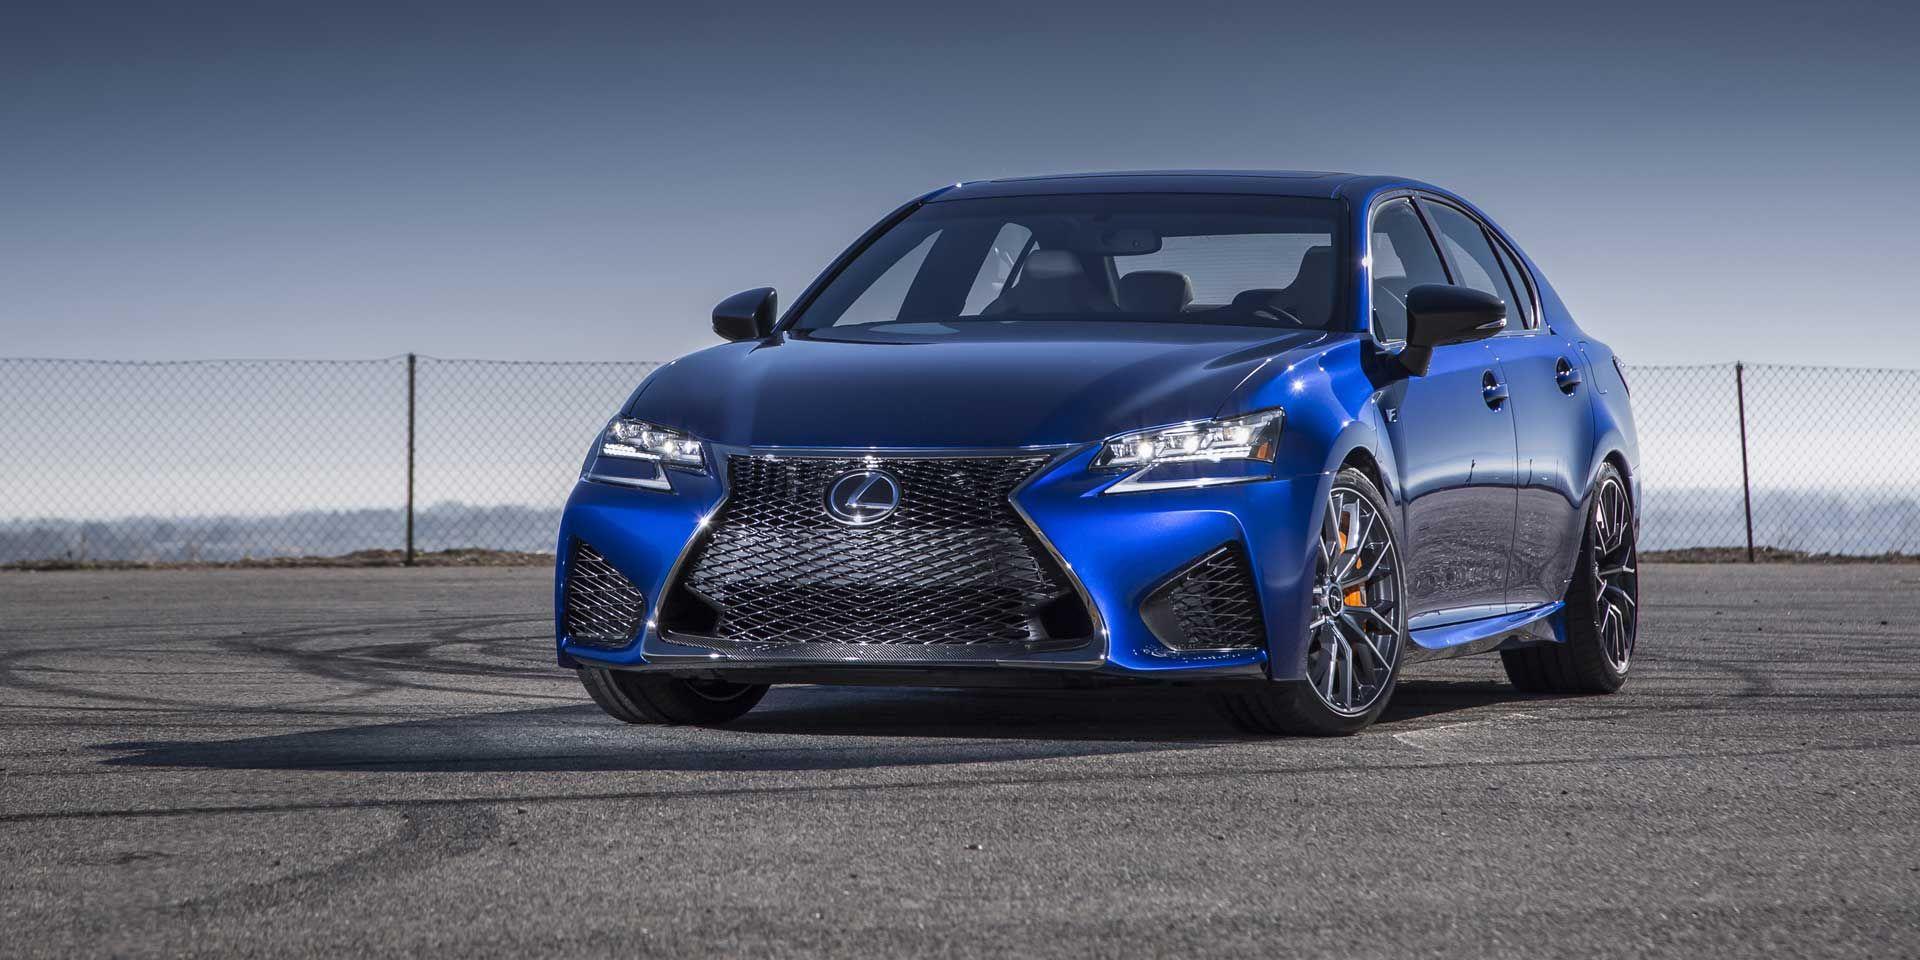 2016 lexus gs 350 Google Search Lexus isf, Car, Top cars